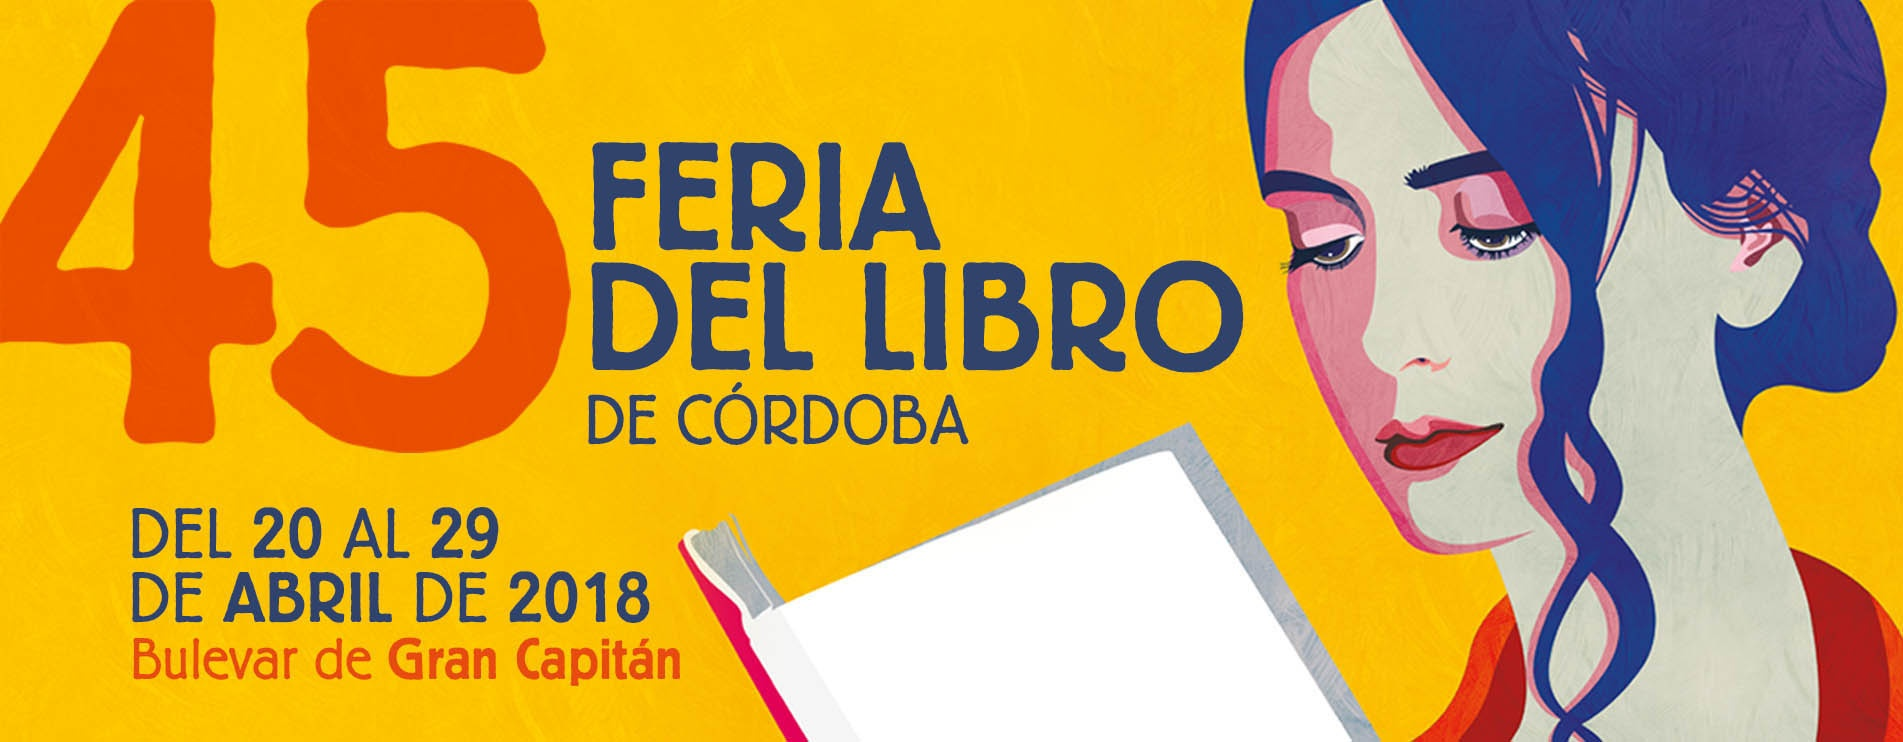 45 Feria del Libro de Córdoba